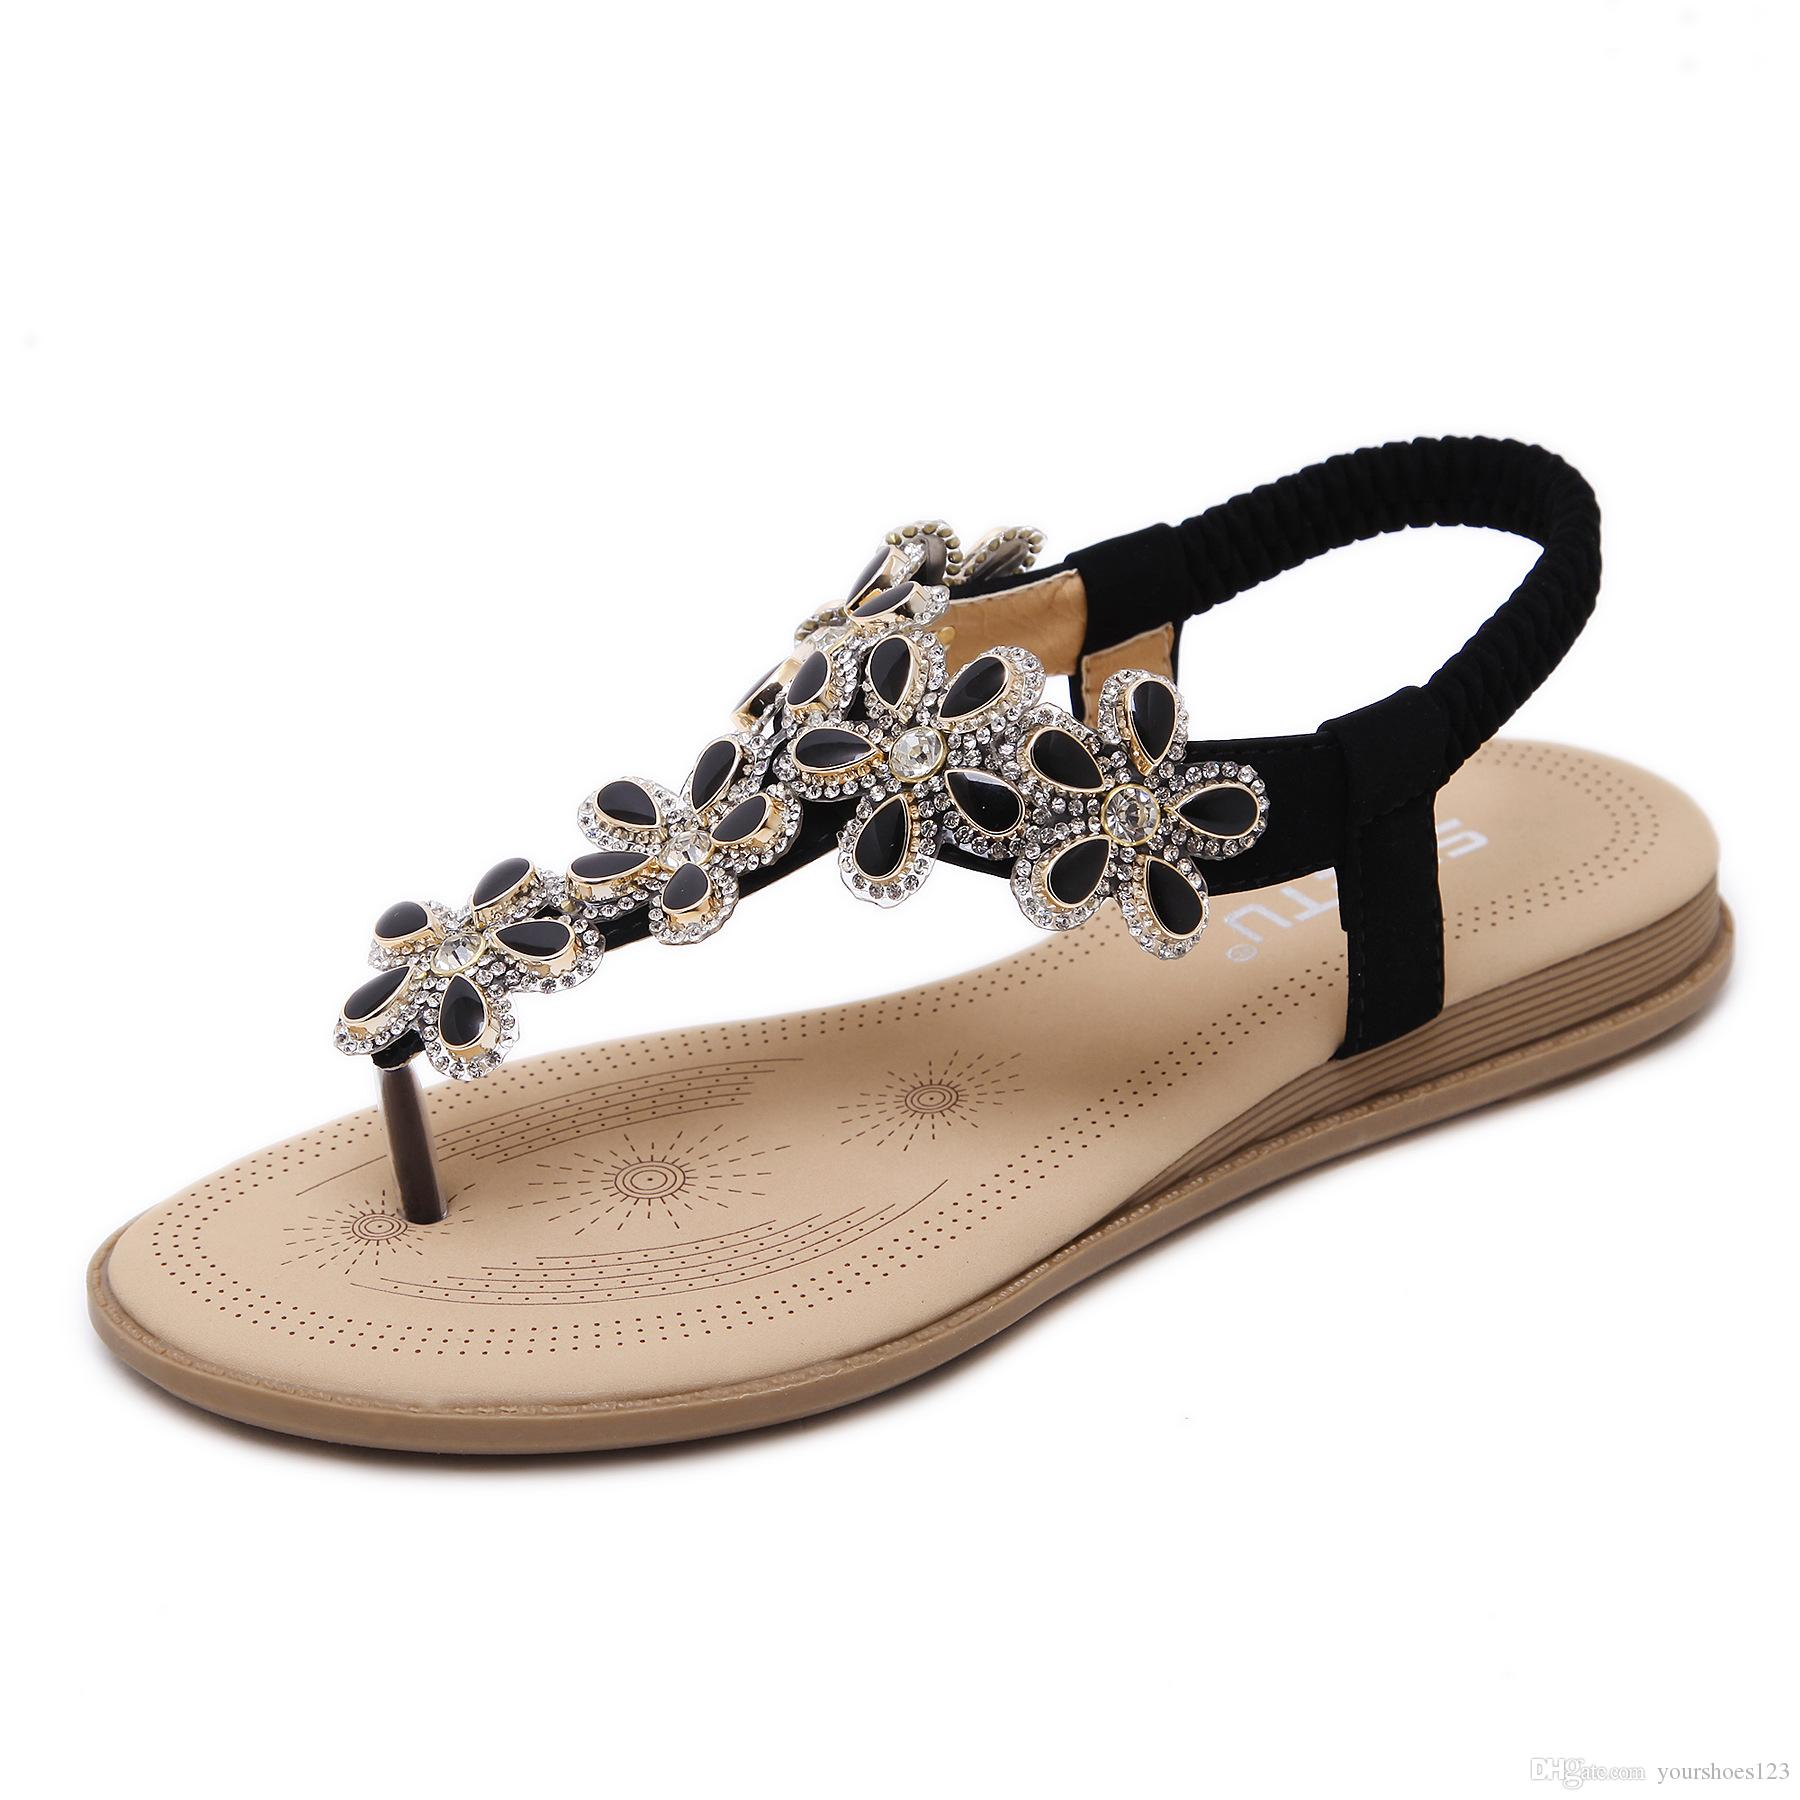 ea57cdc7d 2018 Summer New Fashion Large Size Comfortable Flip Flops Sandals Flowers  Diamond Buckles Elastic Women  Shoes Casual Flat Sandals White Sandals  Wedge Heels ...